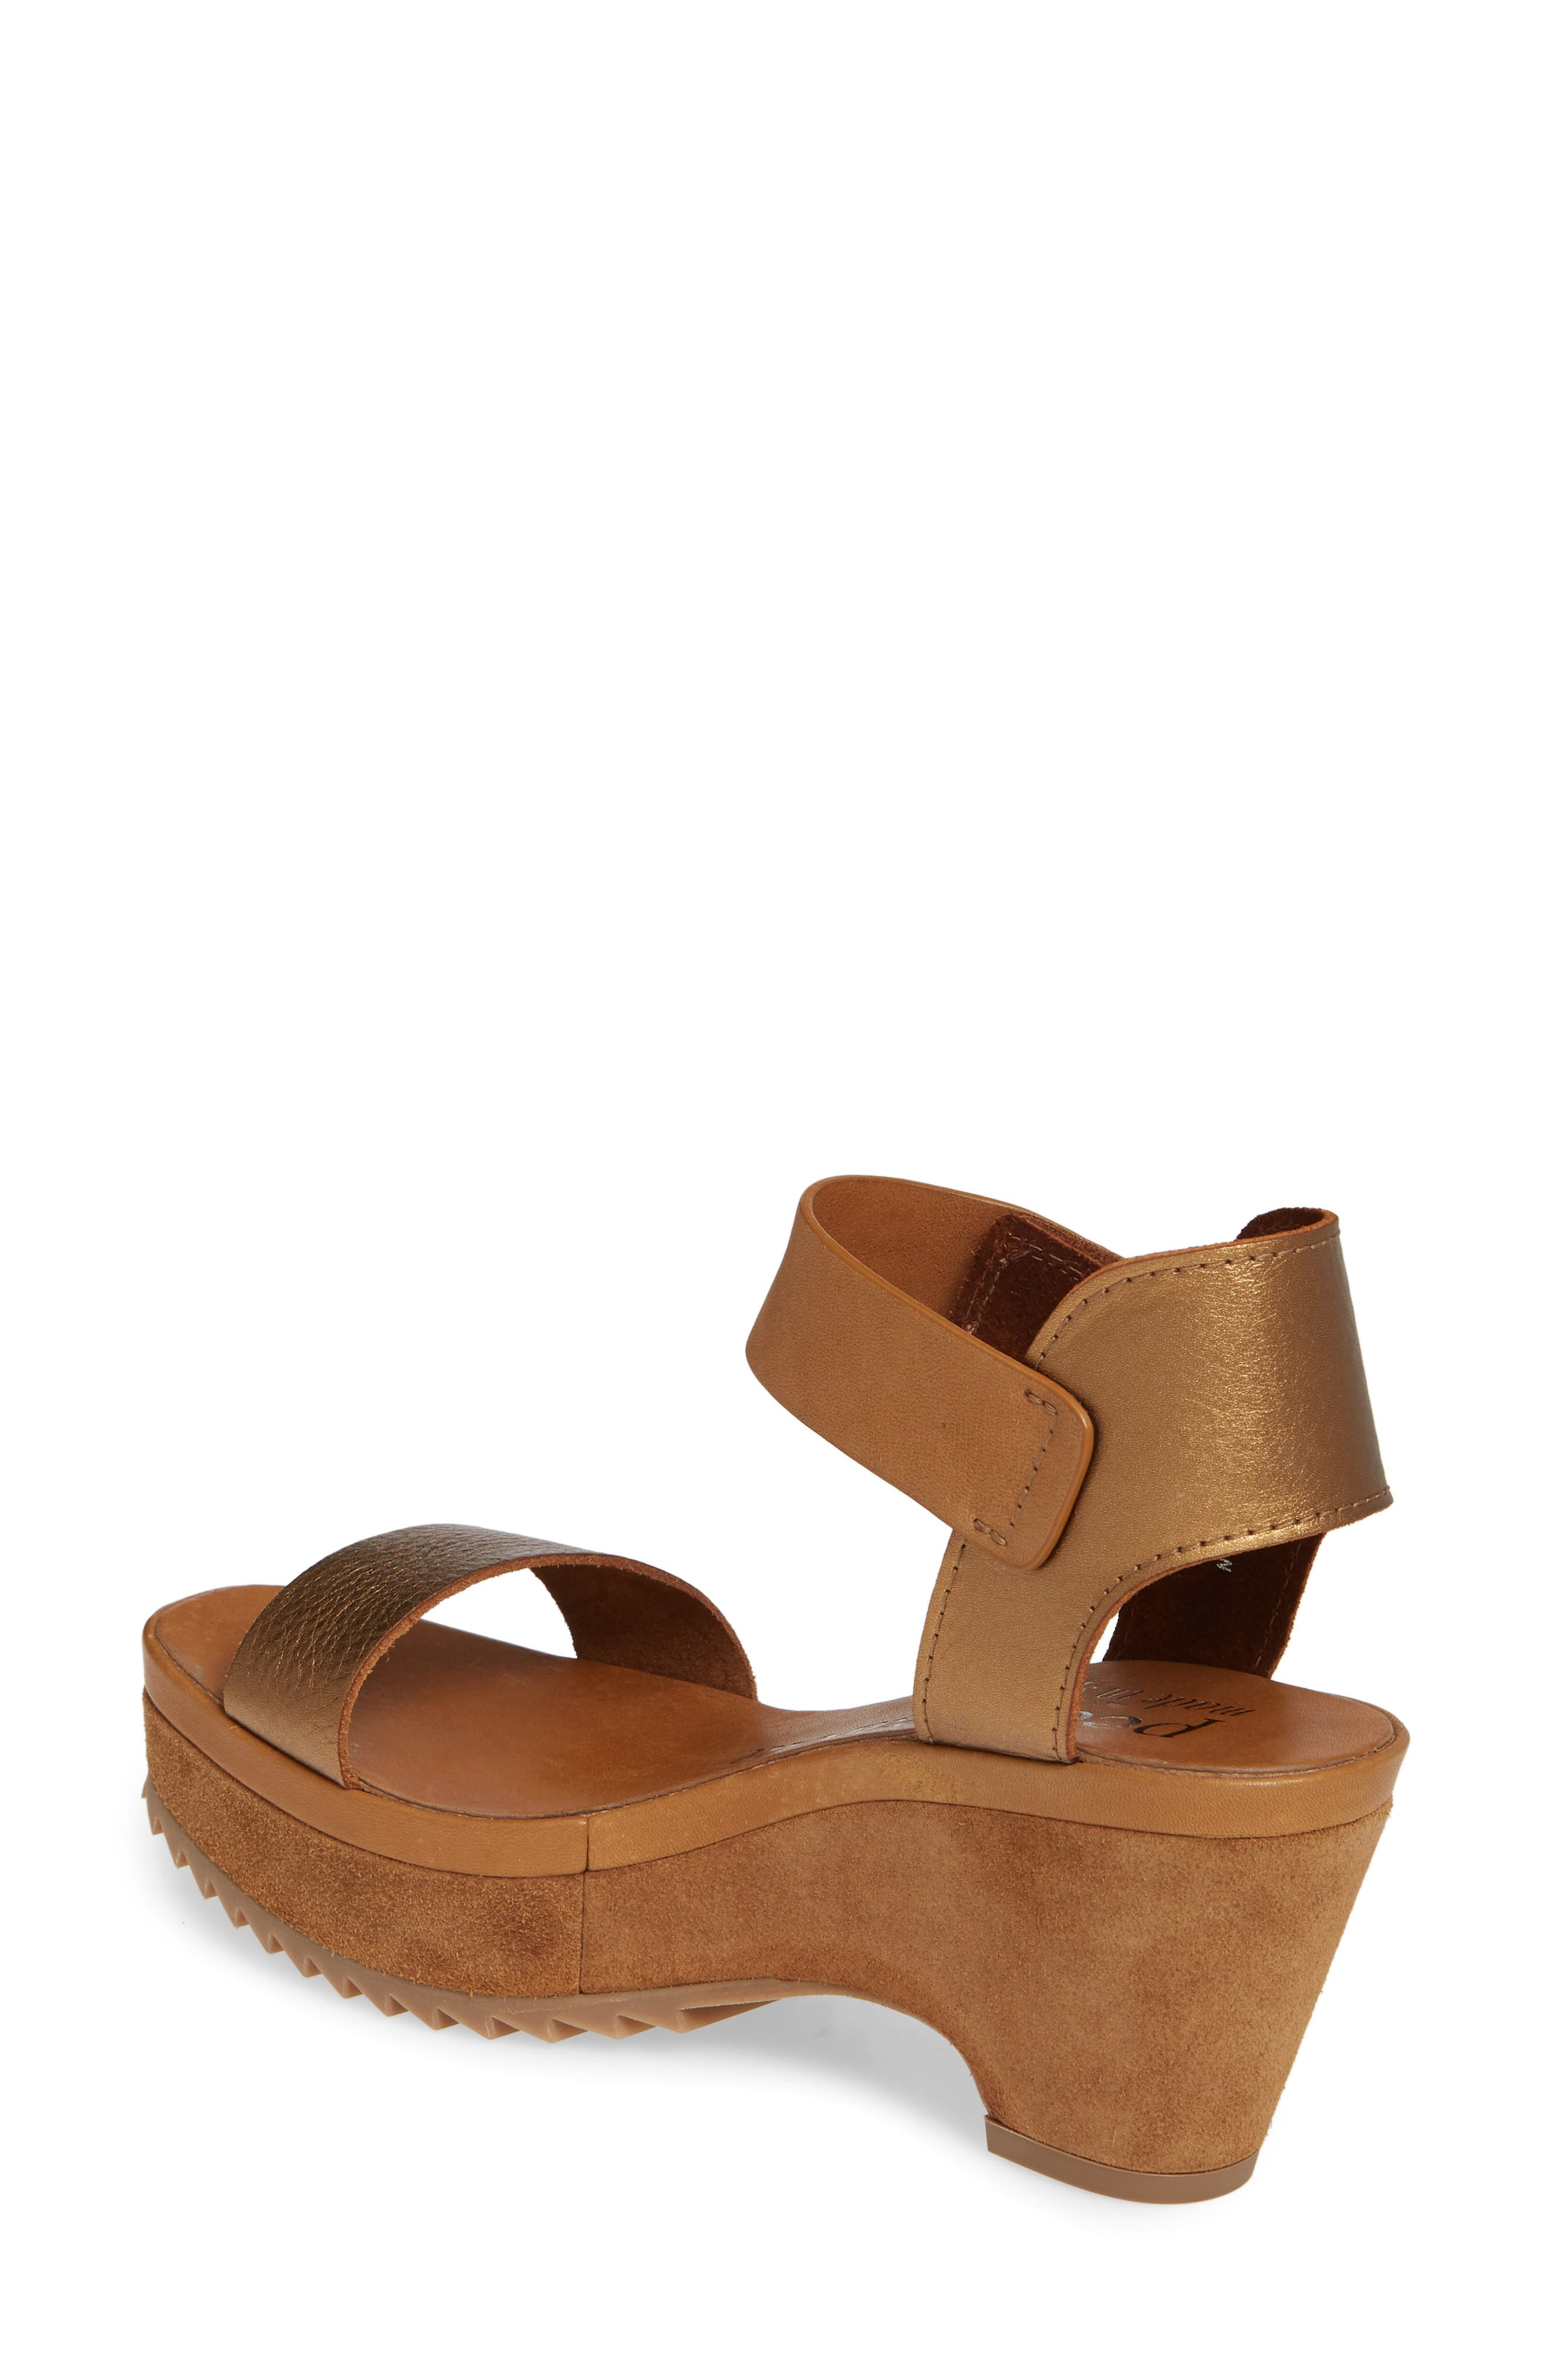 PEDRO GARCIA, Franses Flatform Sandal, Alternate thumbnail 2, color, TOBACCO CERVO LAME